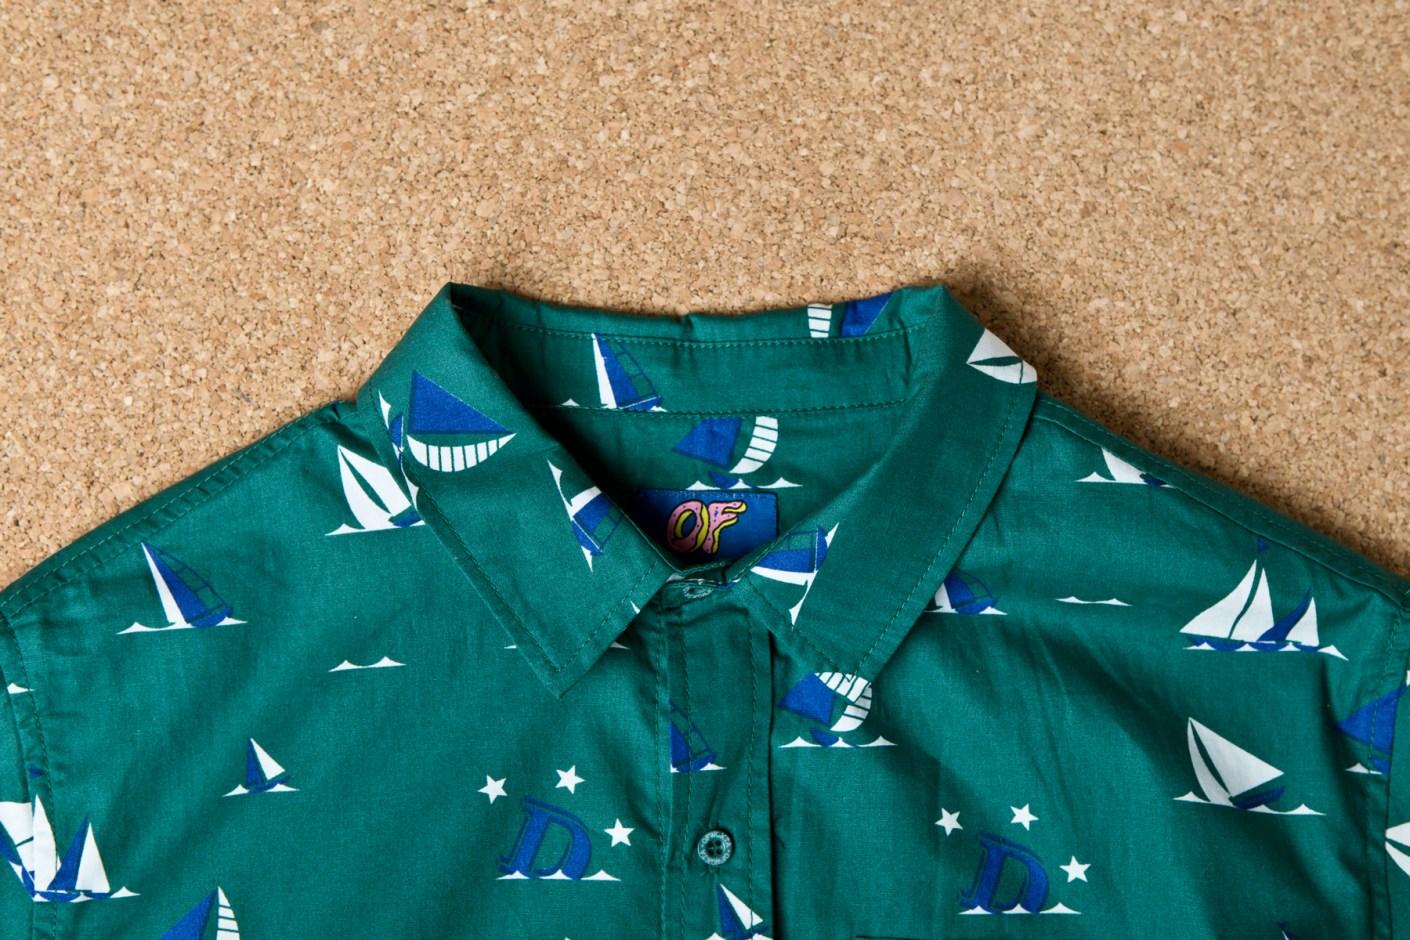 Image of Odd Future 2014 Spring/Summer Shirts